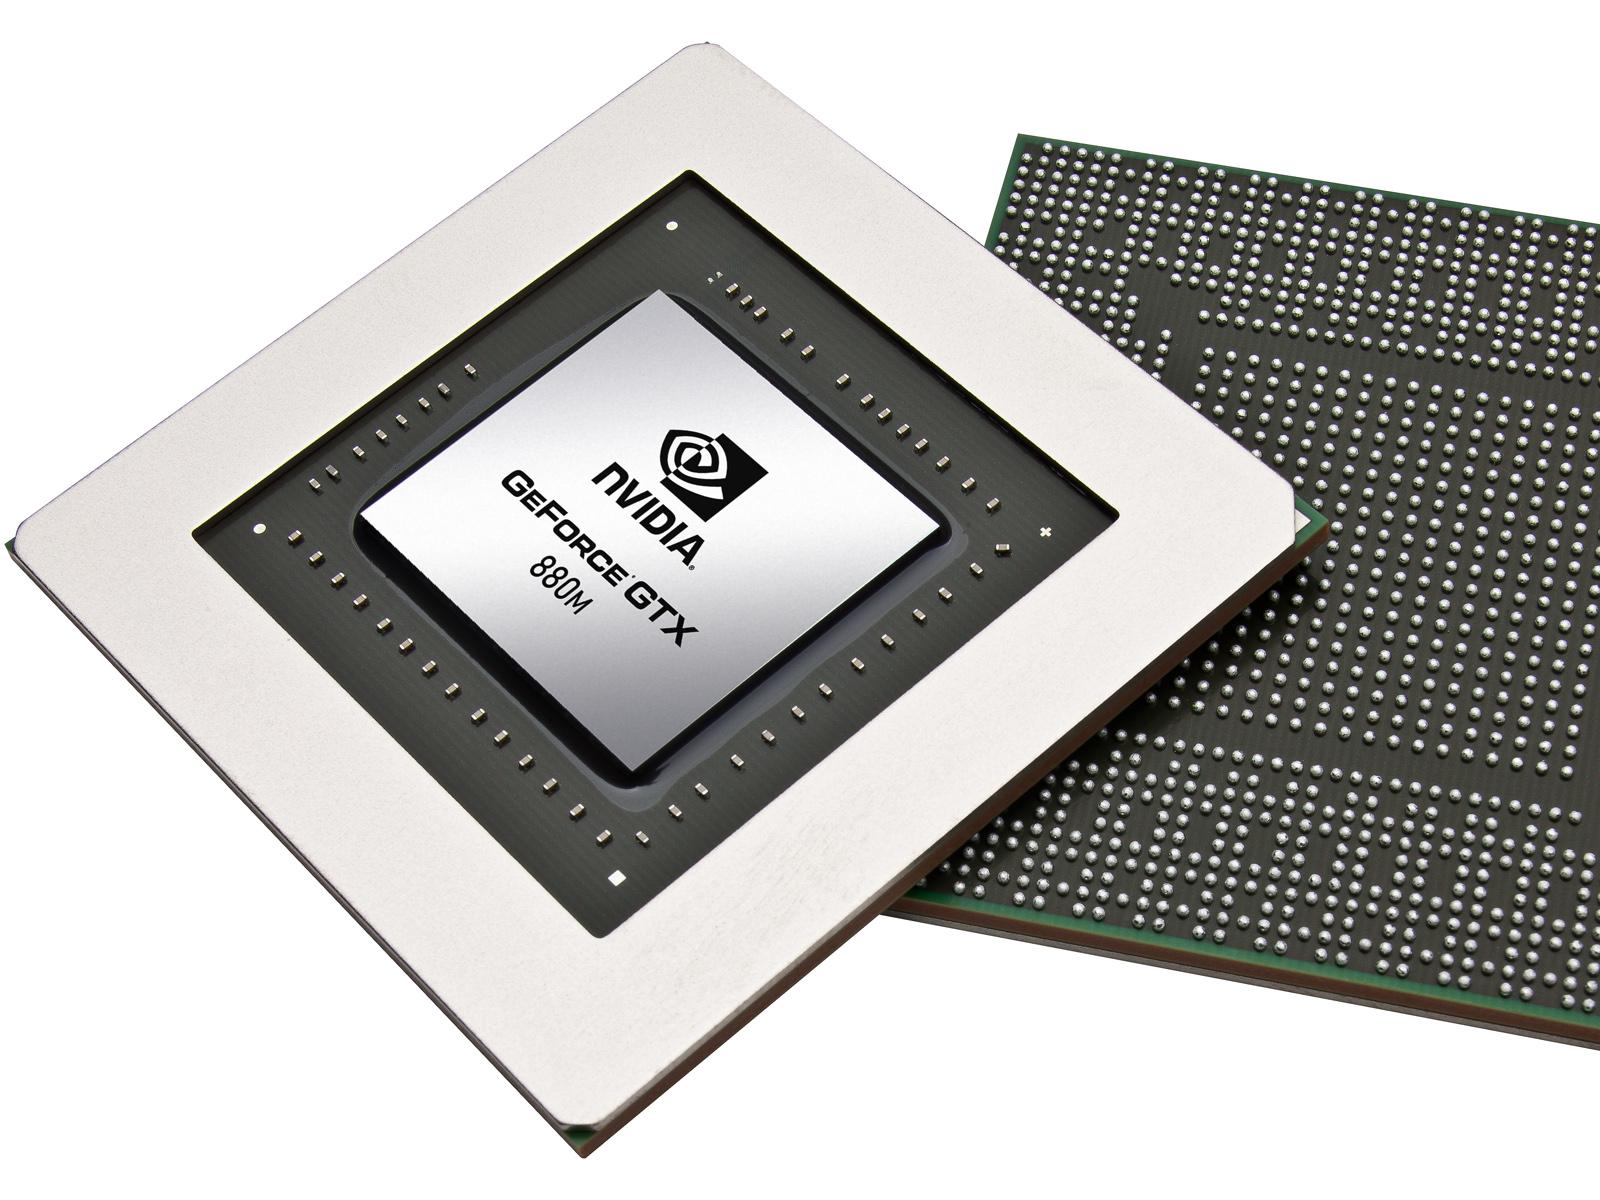 Amd Firepro M6100 Vs Nvidia Geforce Gtx 880m Sli Vs Nvidia Geforce Gtx 860m Sli